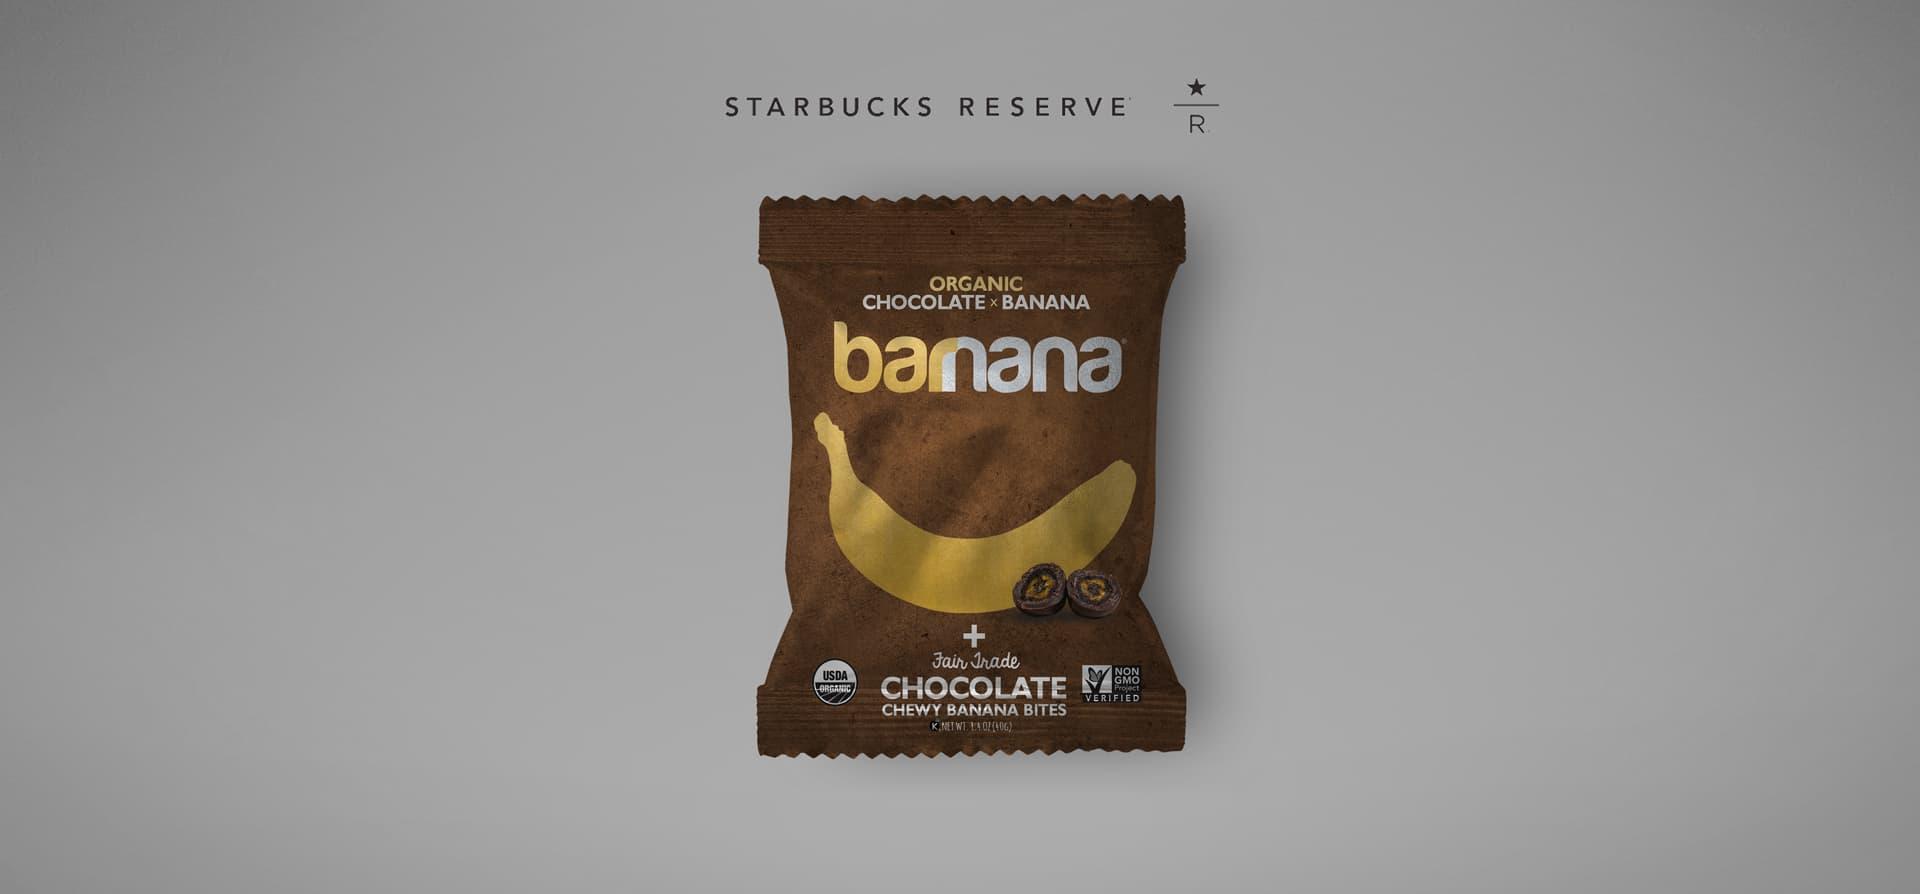 Barnana x Starbucks Reserve